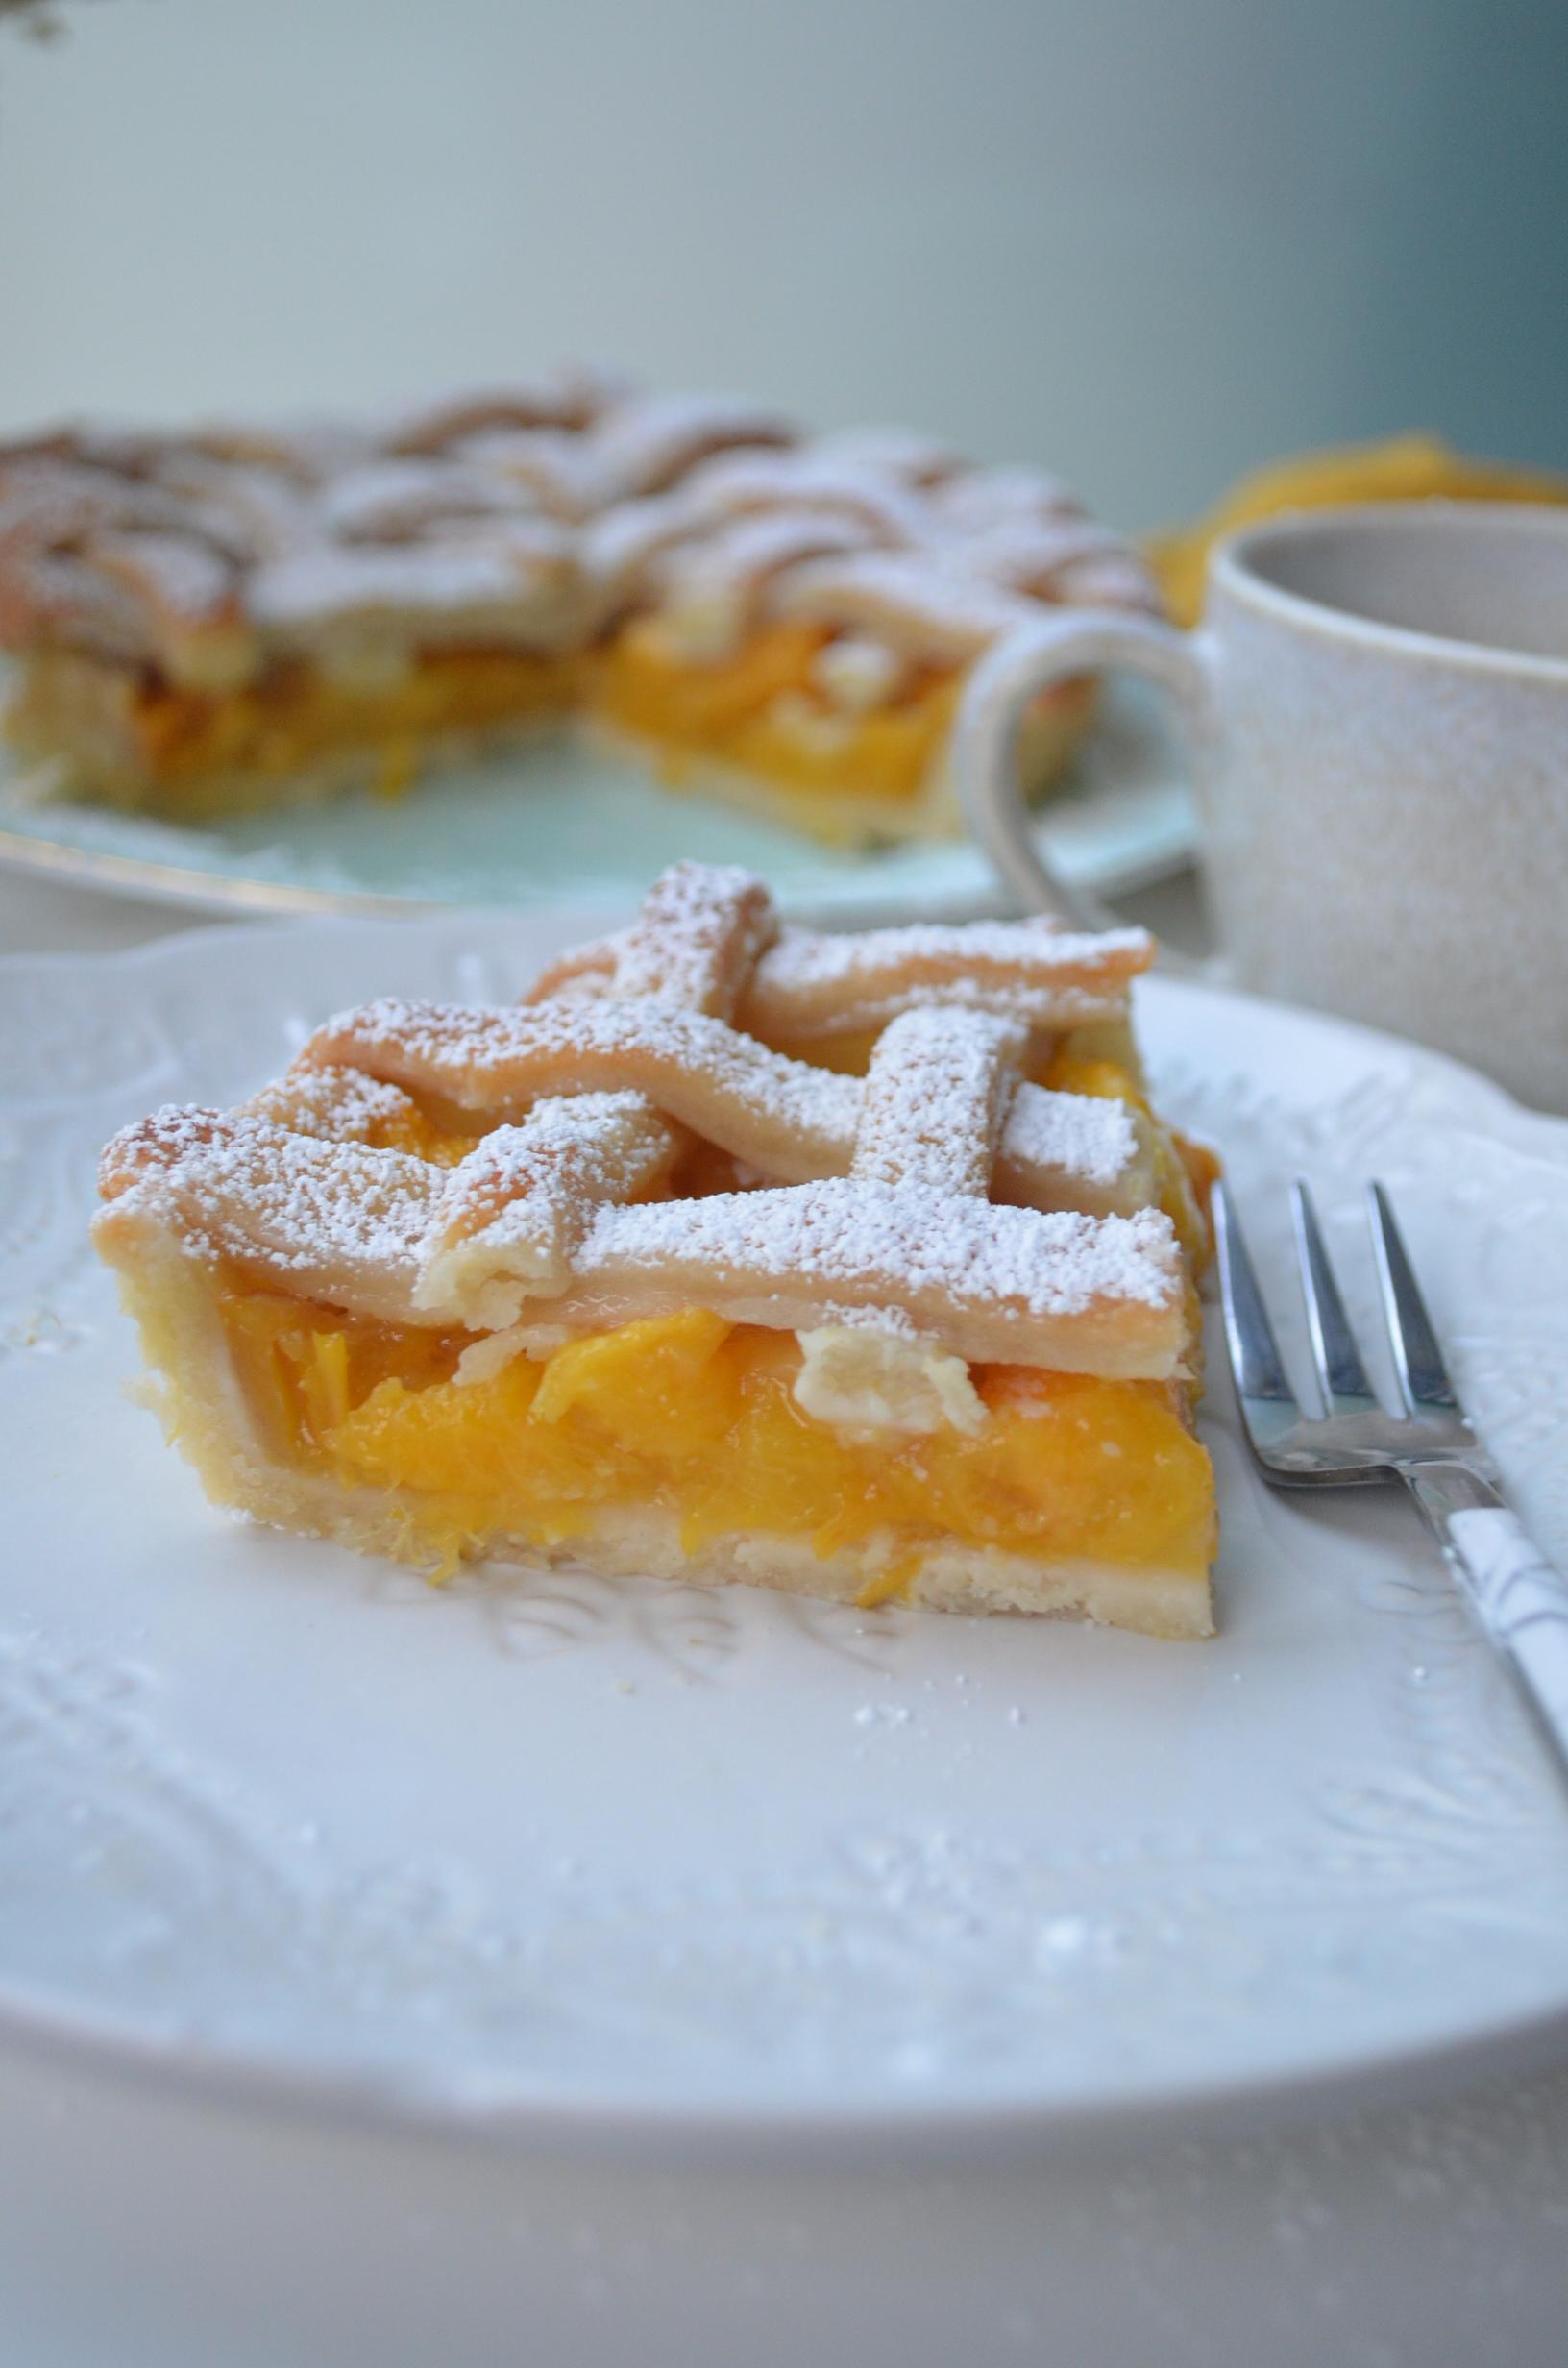 Peach Mango Pie For Two